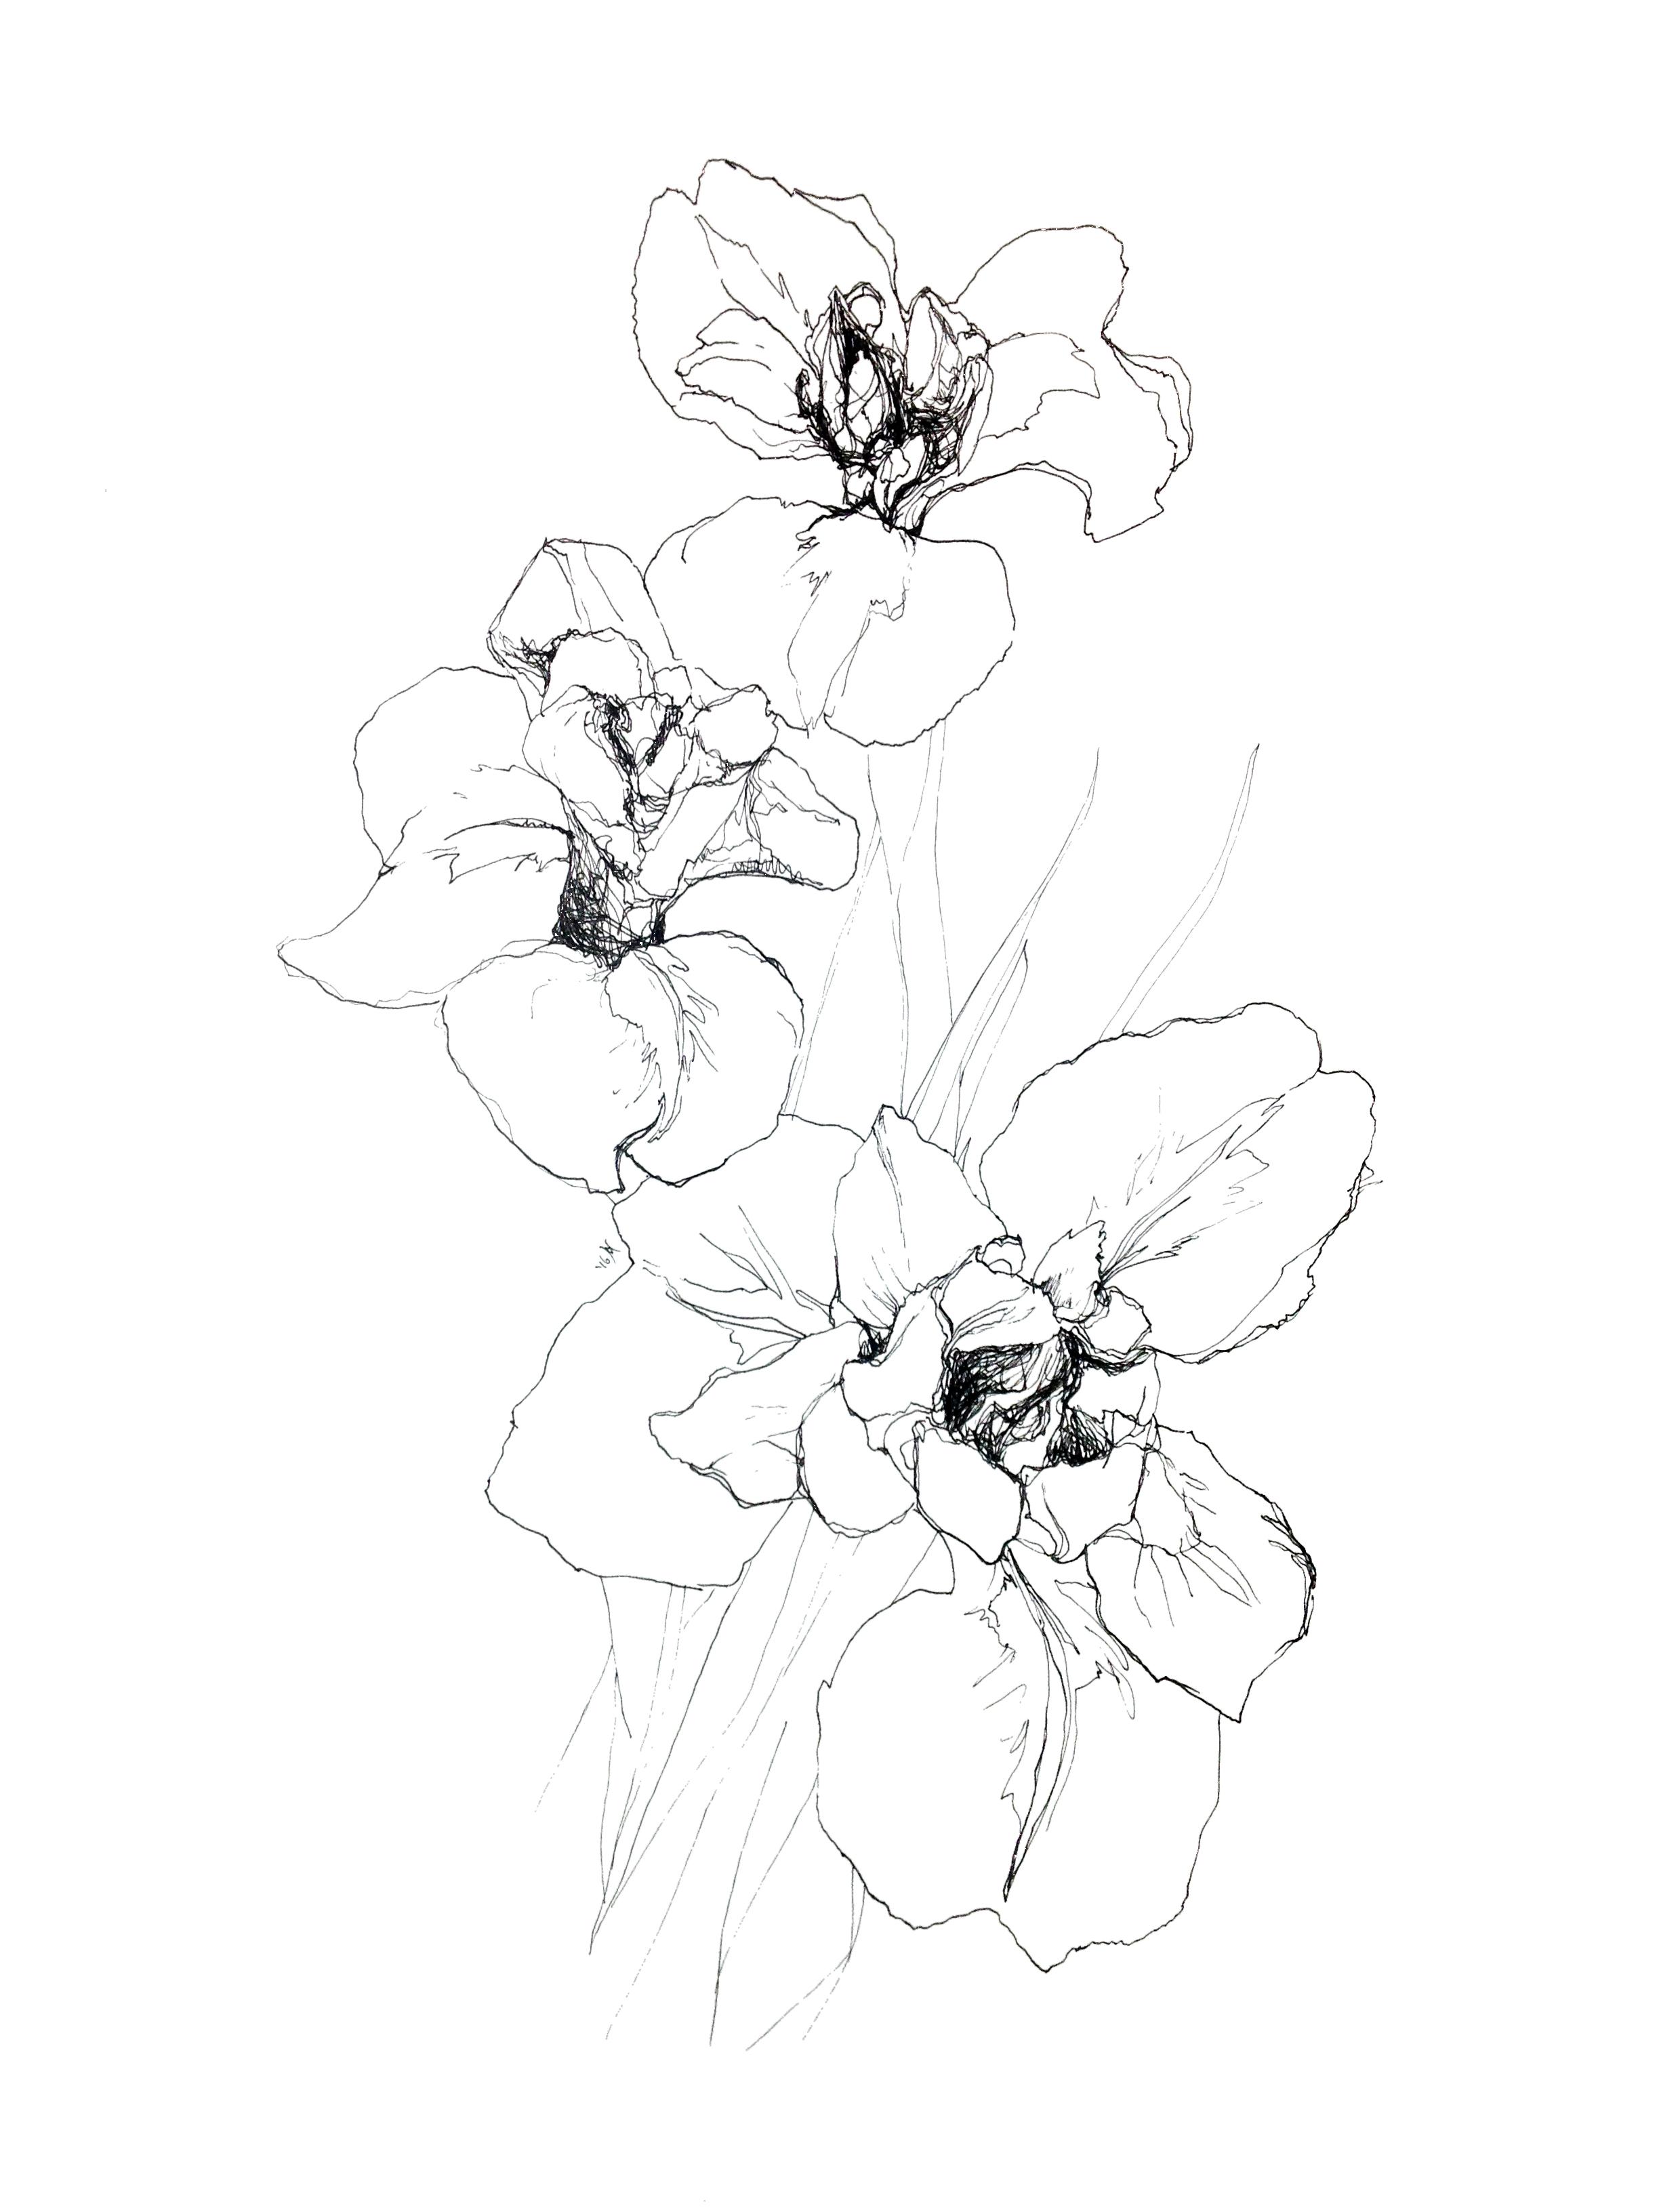 'Iris' , Staedler pigment liner, 450 x 320, 2016